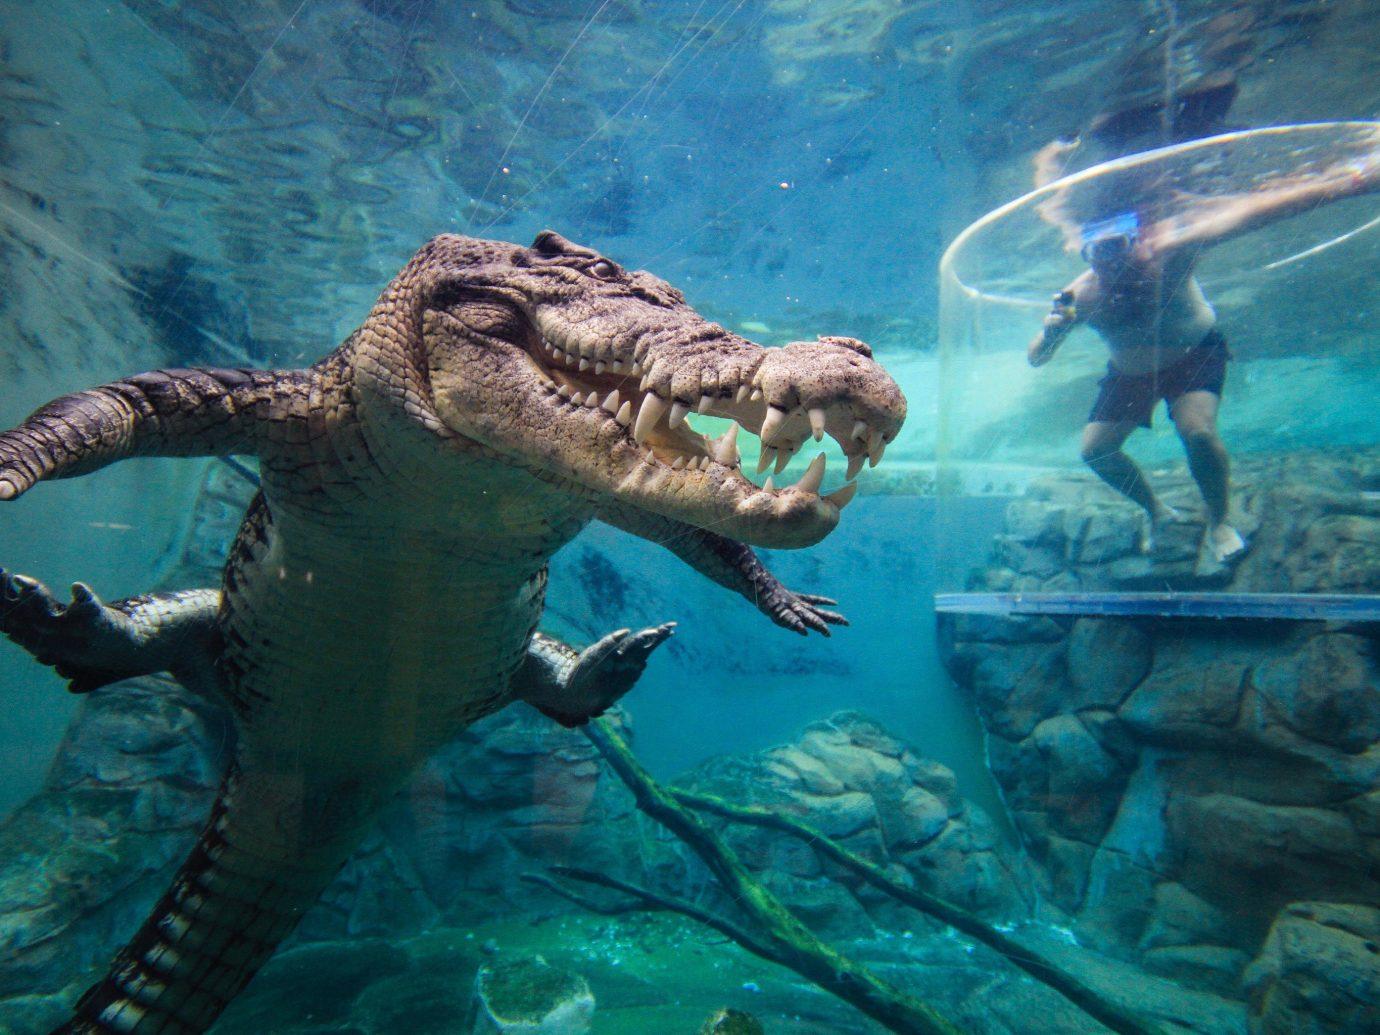 Trip Ideas animal reptile underwater ecosystem rock water marine biology organism crocodilian reptile sea turtle dinosaur turtle computer wallpaper extinction trunk